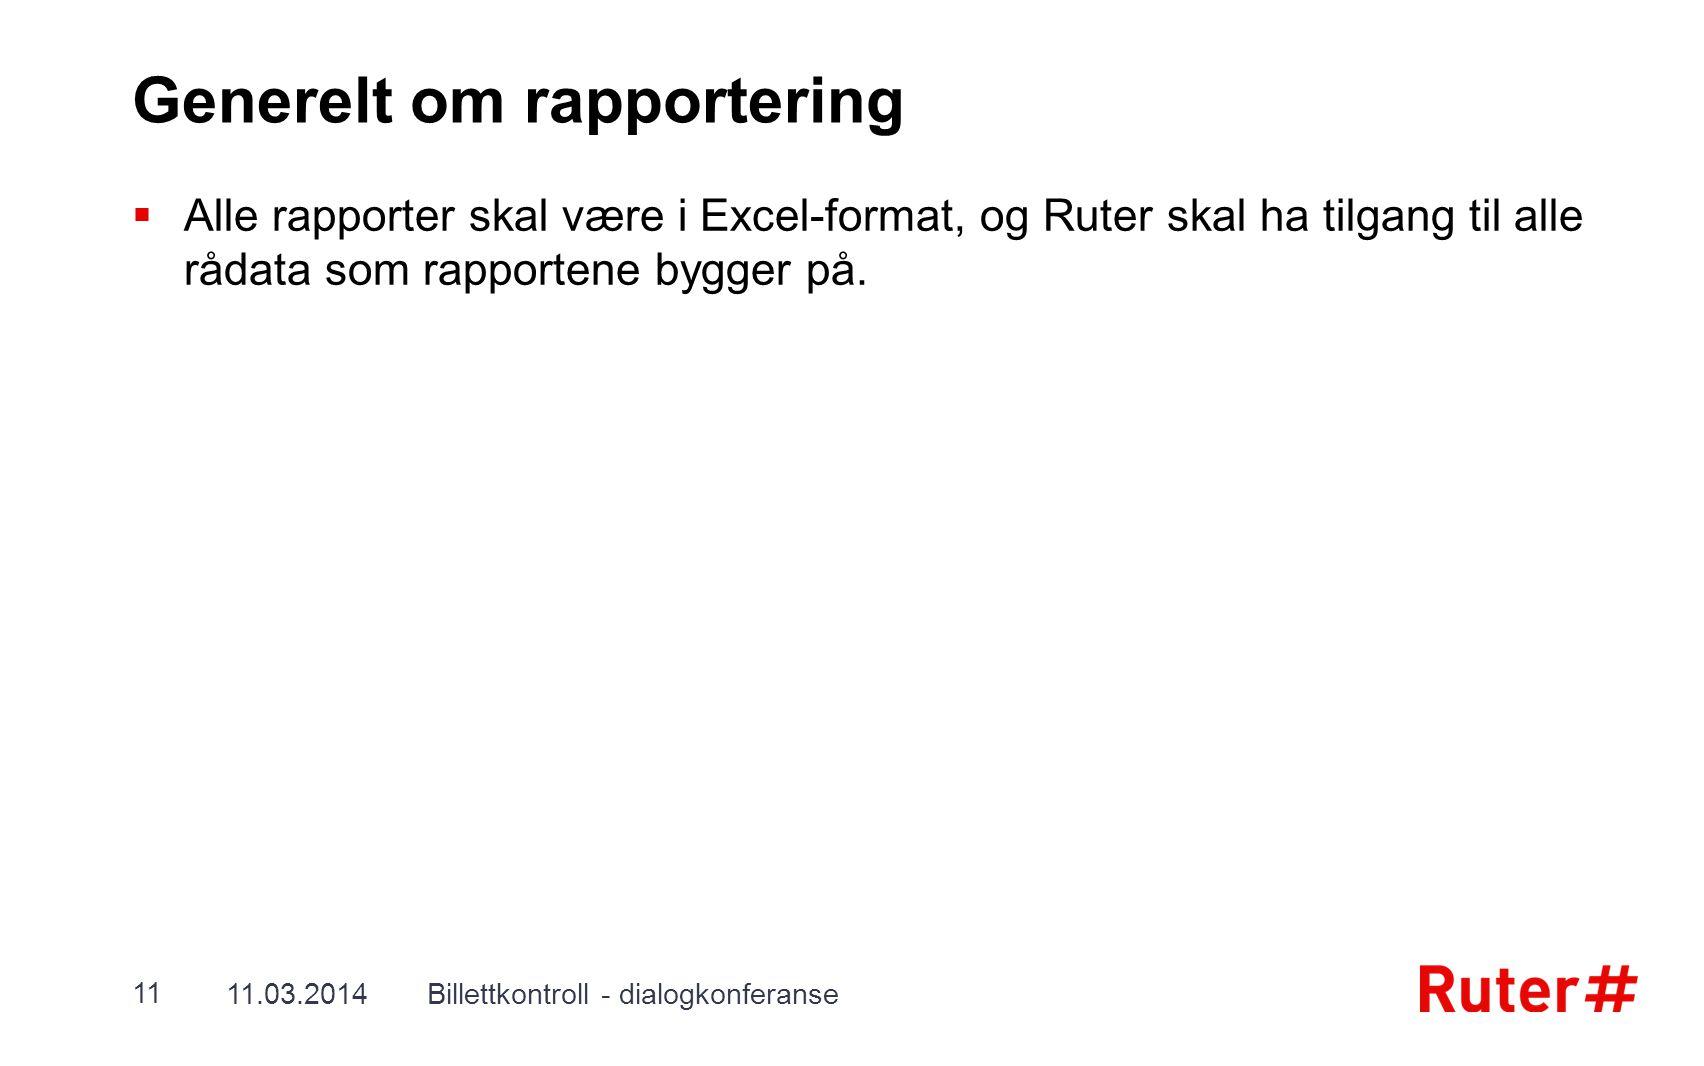 Generelt om rapportering